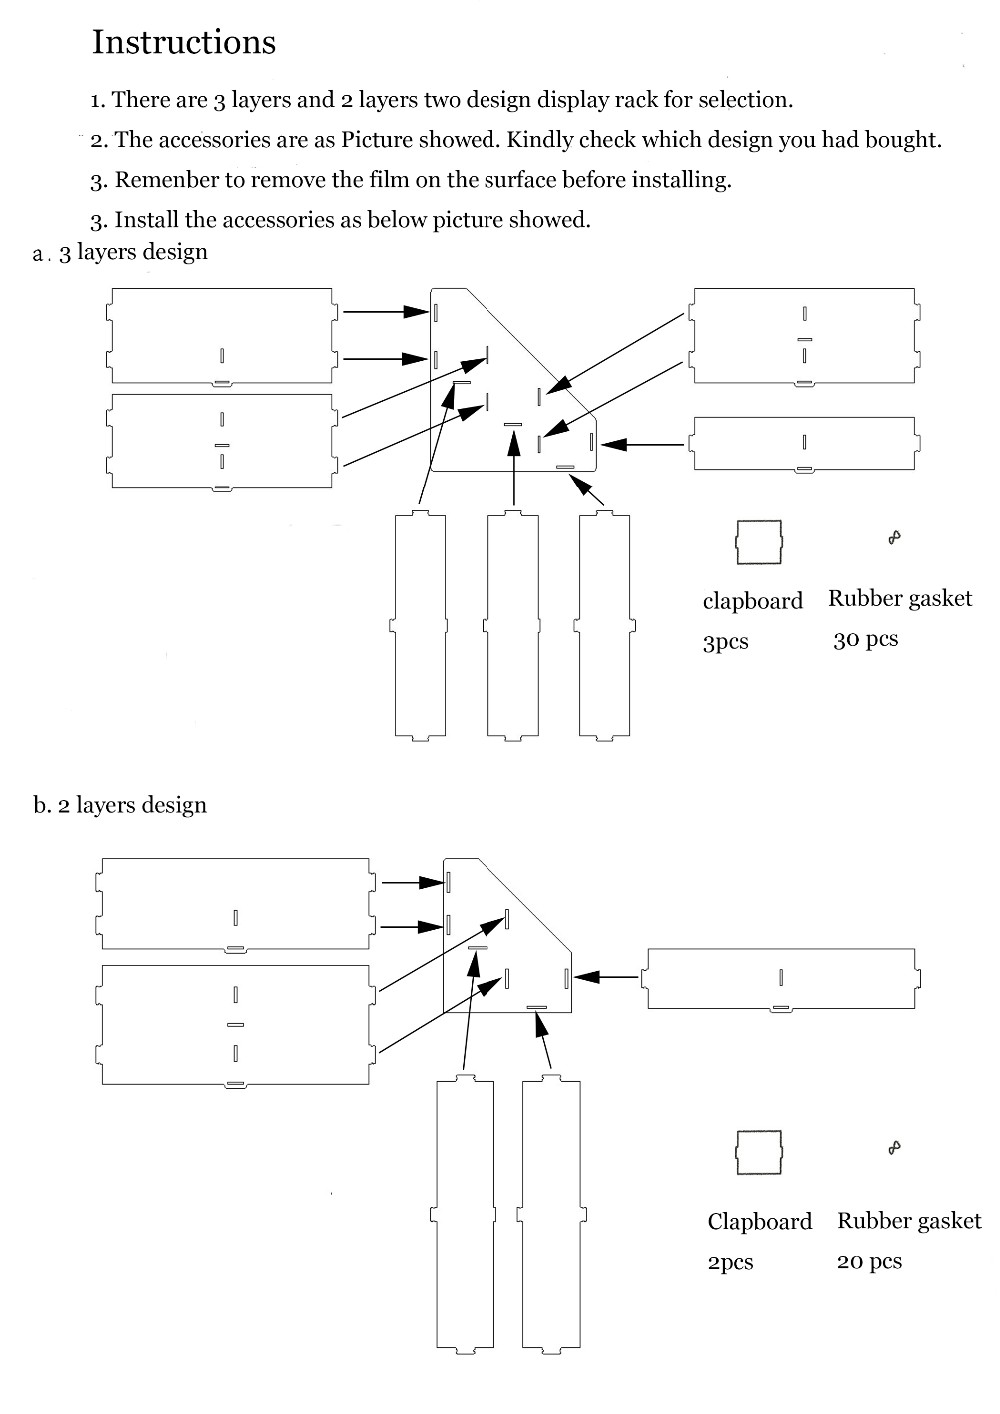 Acrylic display rack instruction